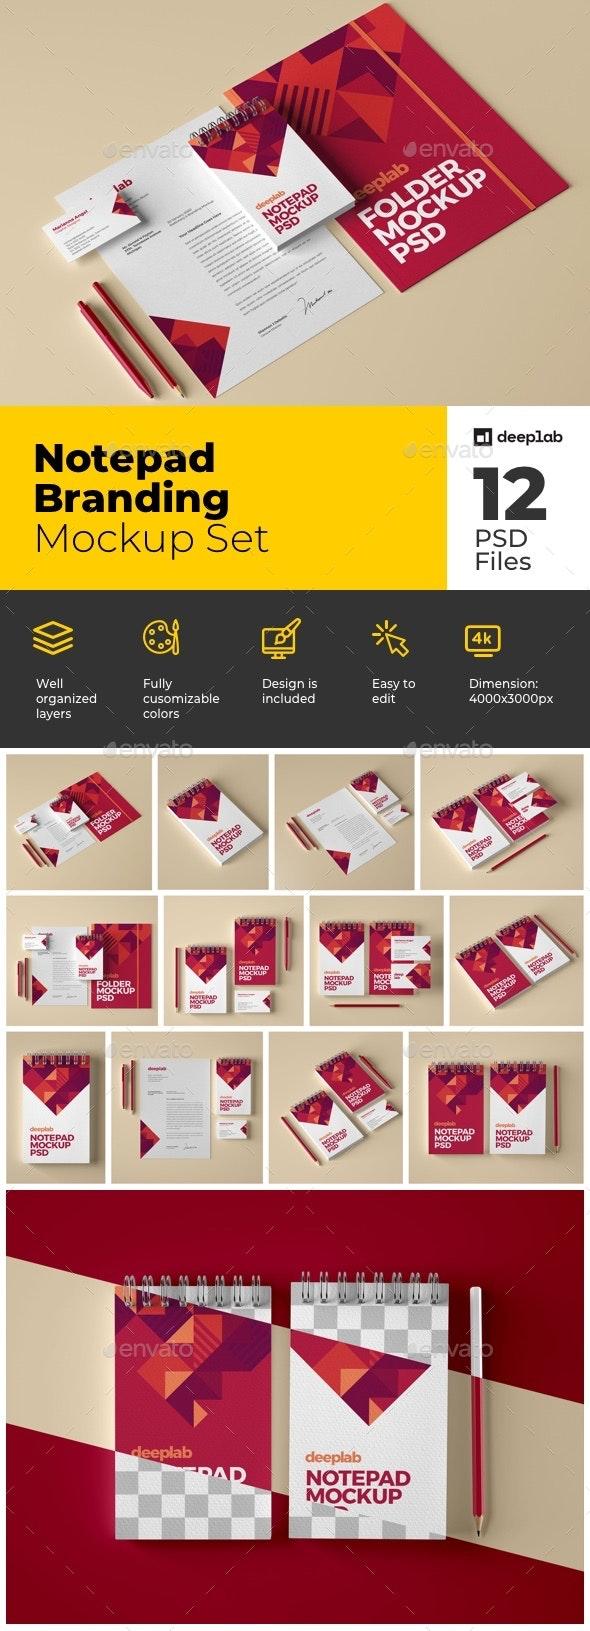 Notepad Branding Mockup Set - Product Mock-Ups Graphics